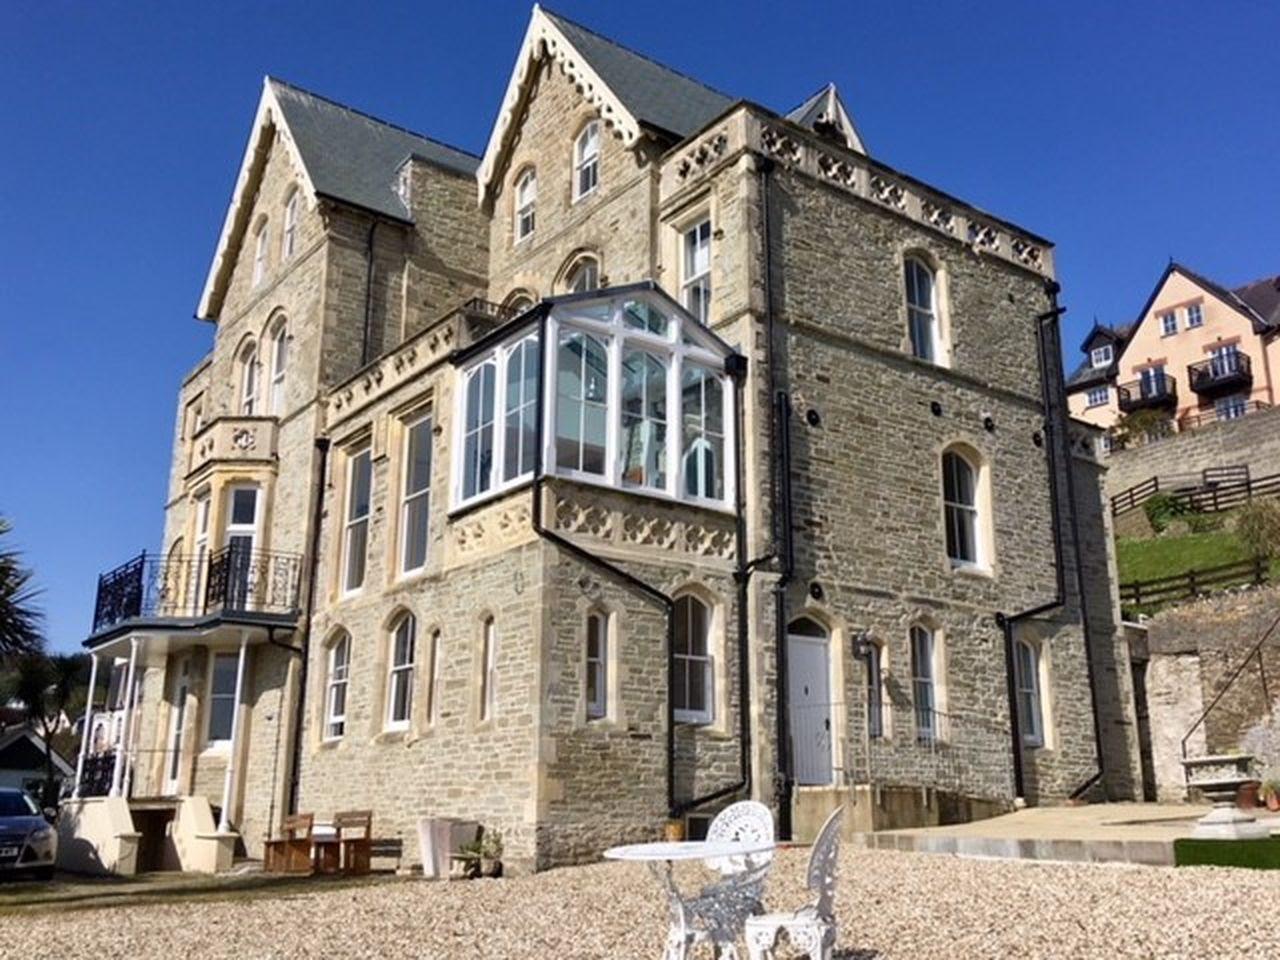 Review: Slimmeria weight loss retreat, Ilfracombe, Devon